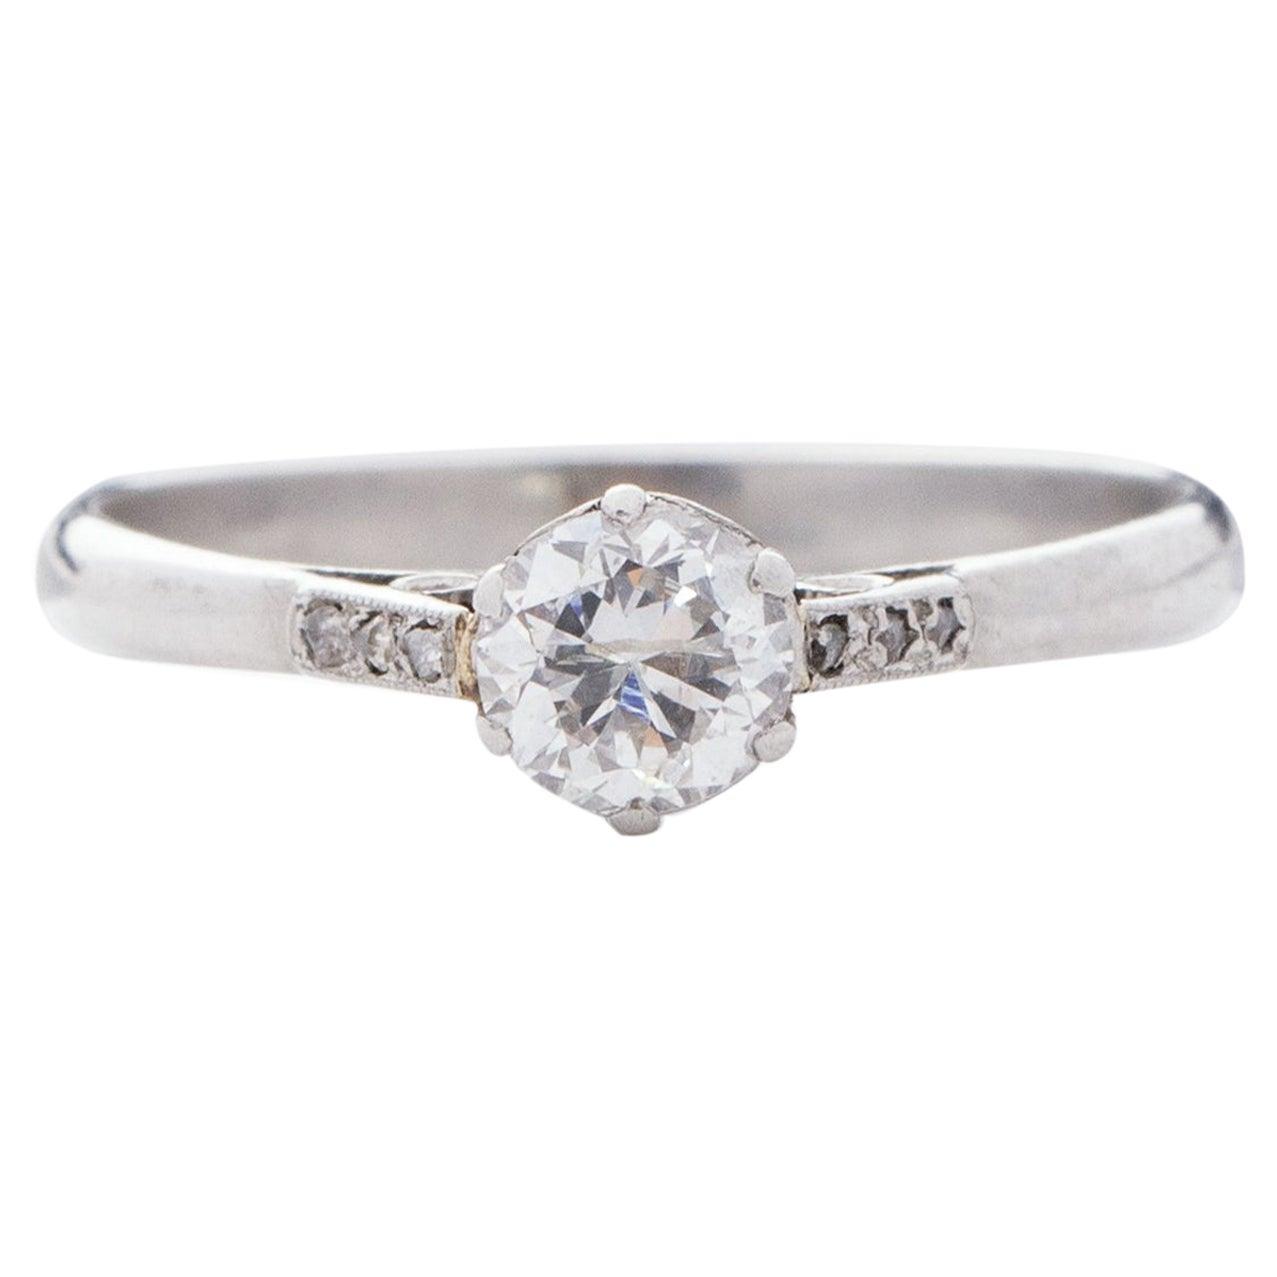 Edwardian 1/2 Carat Old European Cut Solitaire Platinum Engagement Ring